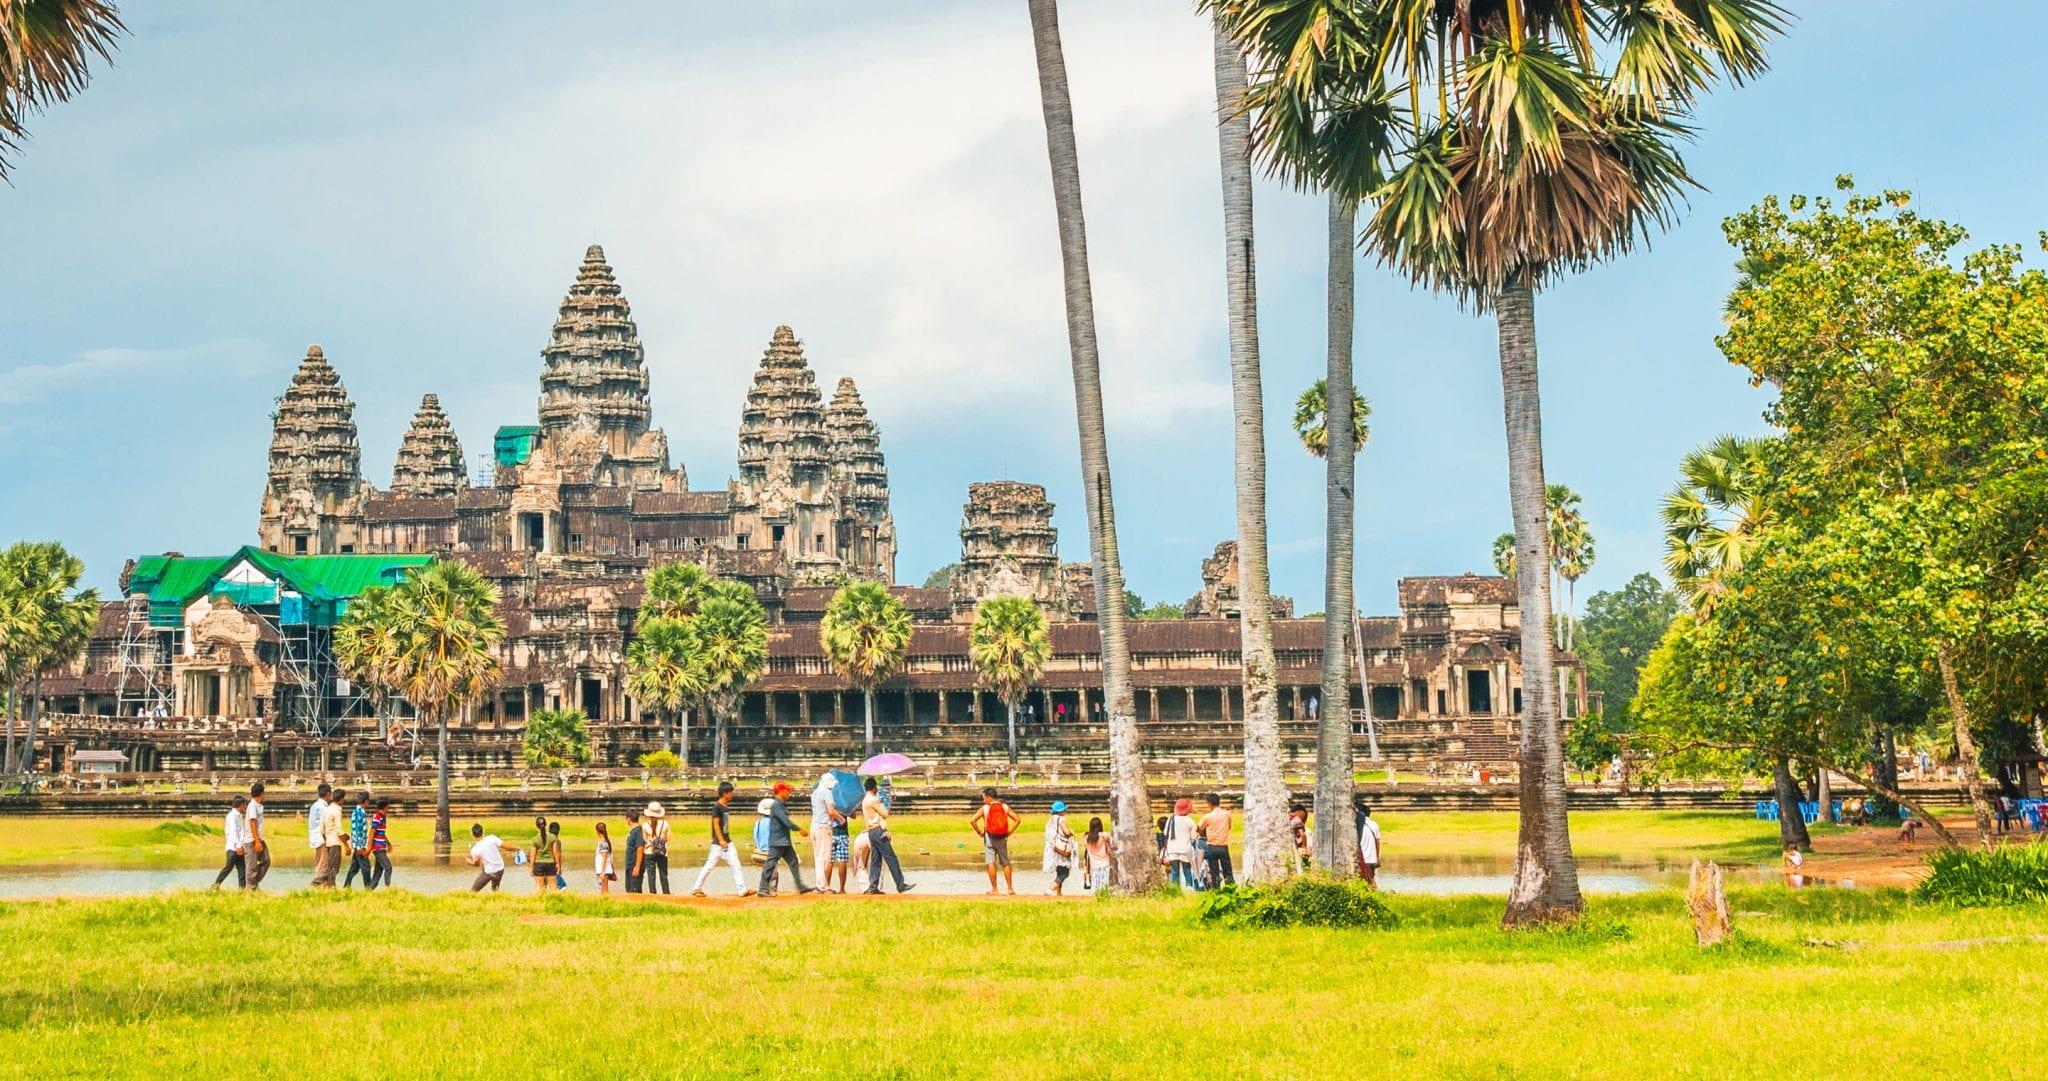 Kambodscha - Tempel und Kolonialflair